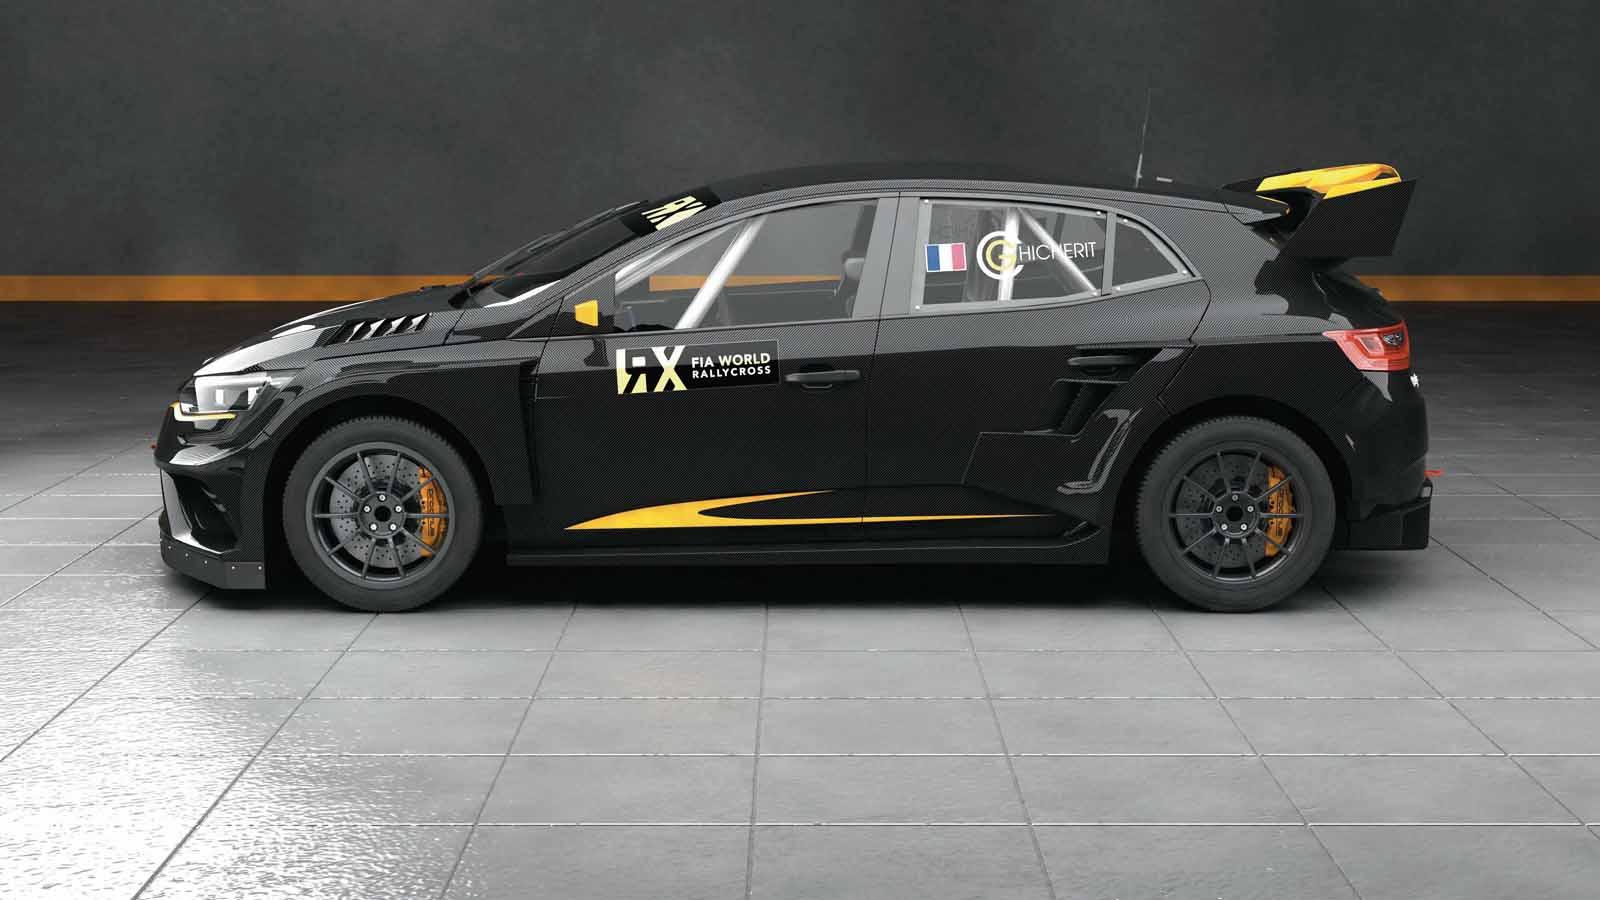 Monster Rally Car Wallpaper Prodrive S Renault Megane Rx Is A Rallycross Supercar